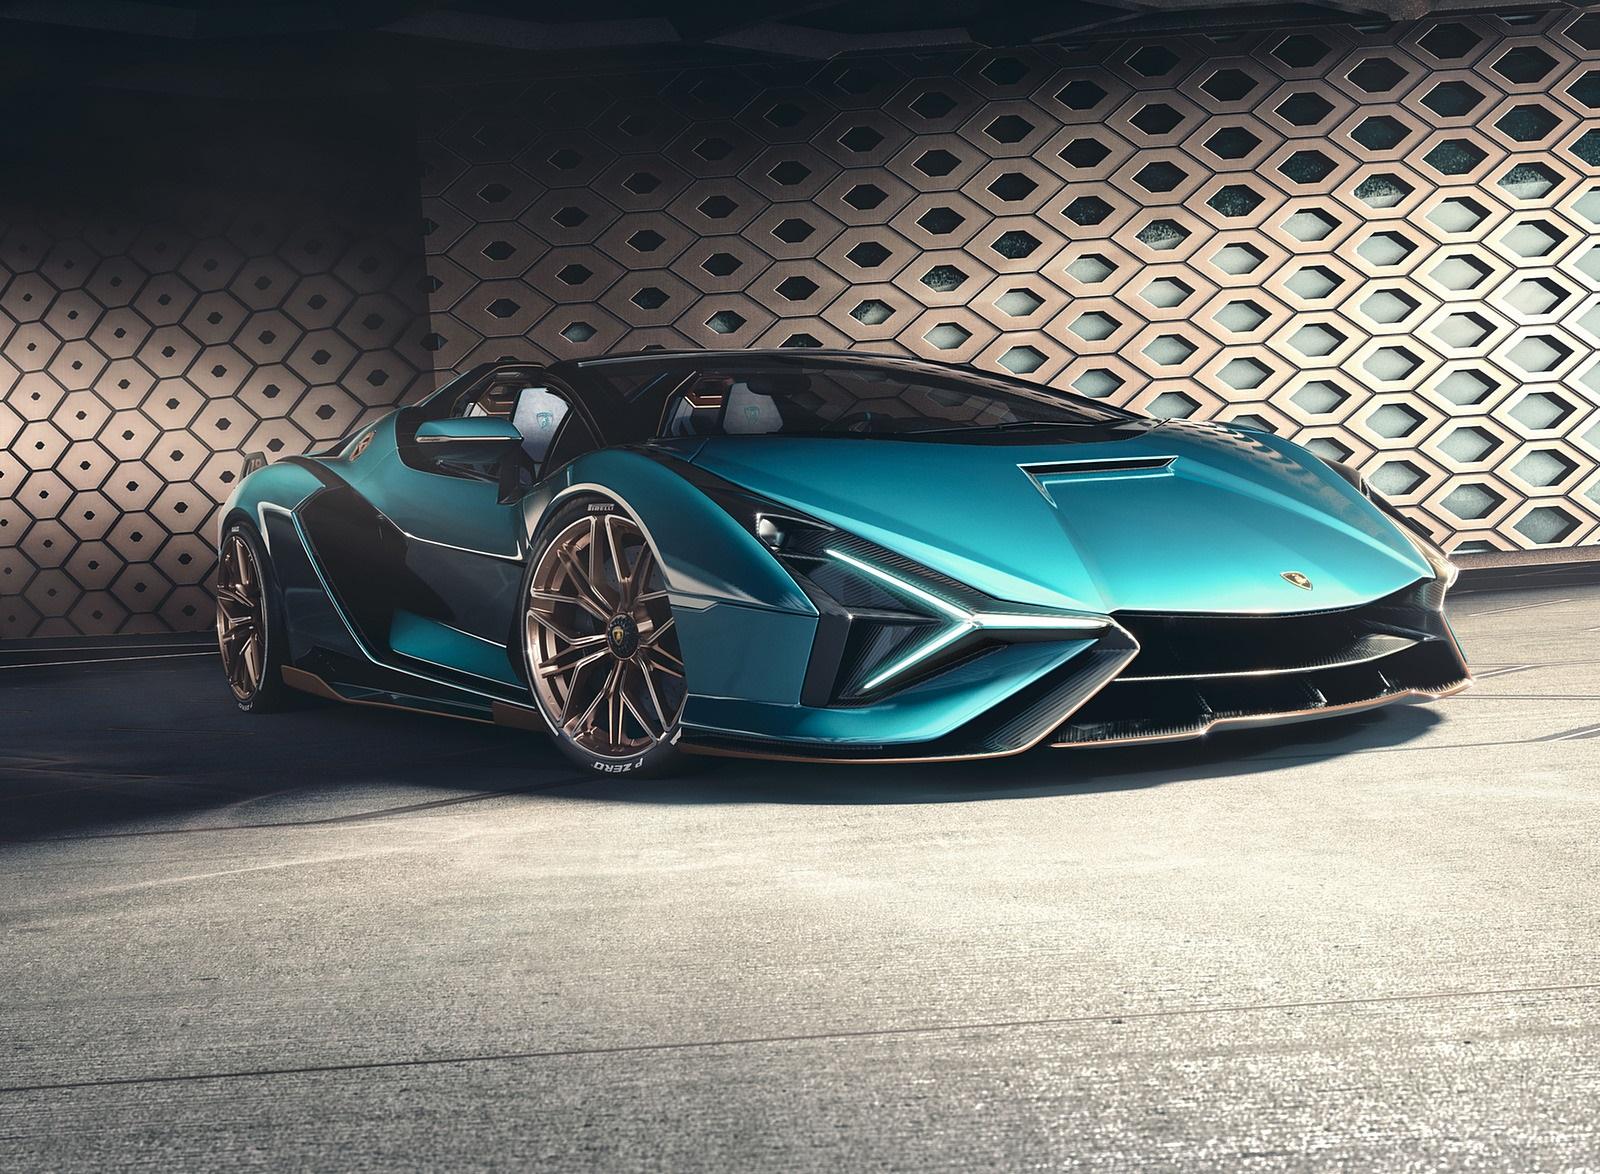 2021 Lamborghini Sián Roadster Front Three-Quarter Wallpapers #11 of 19